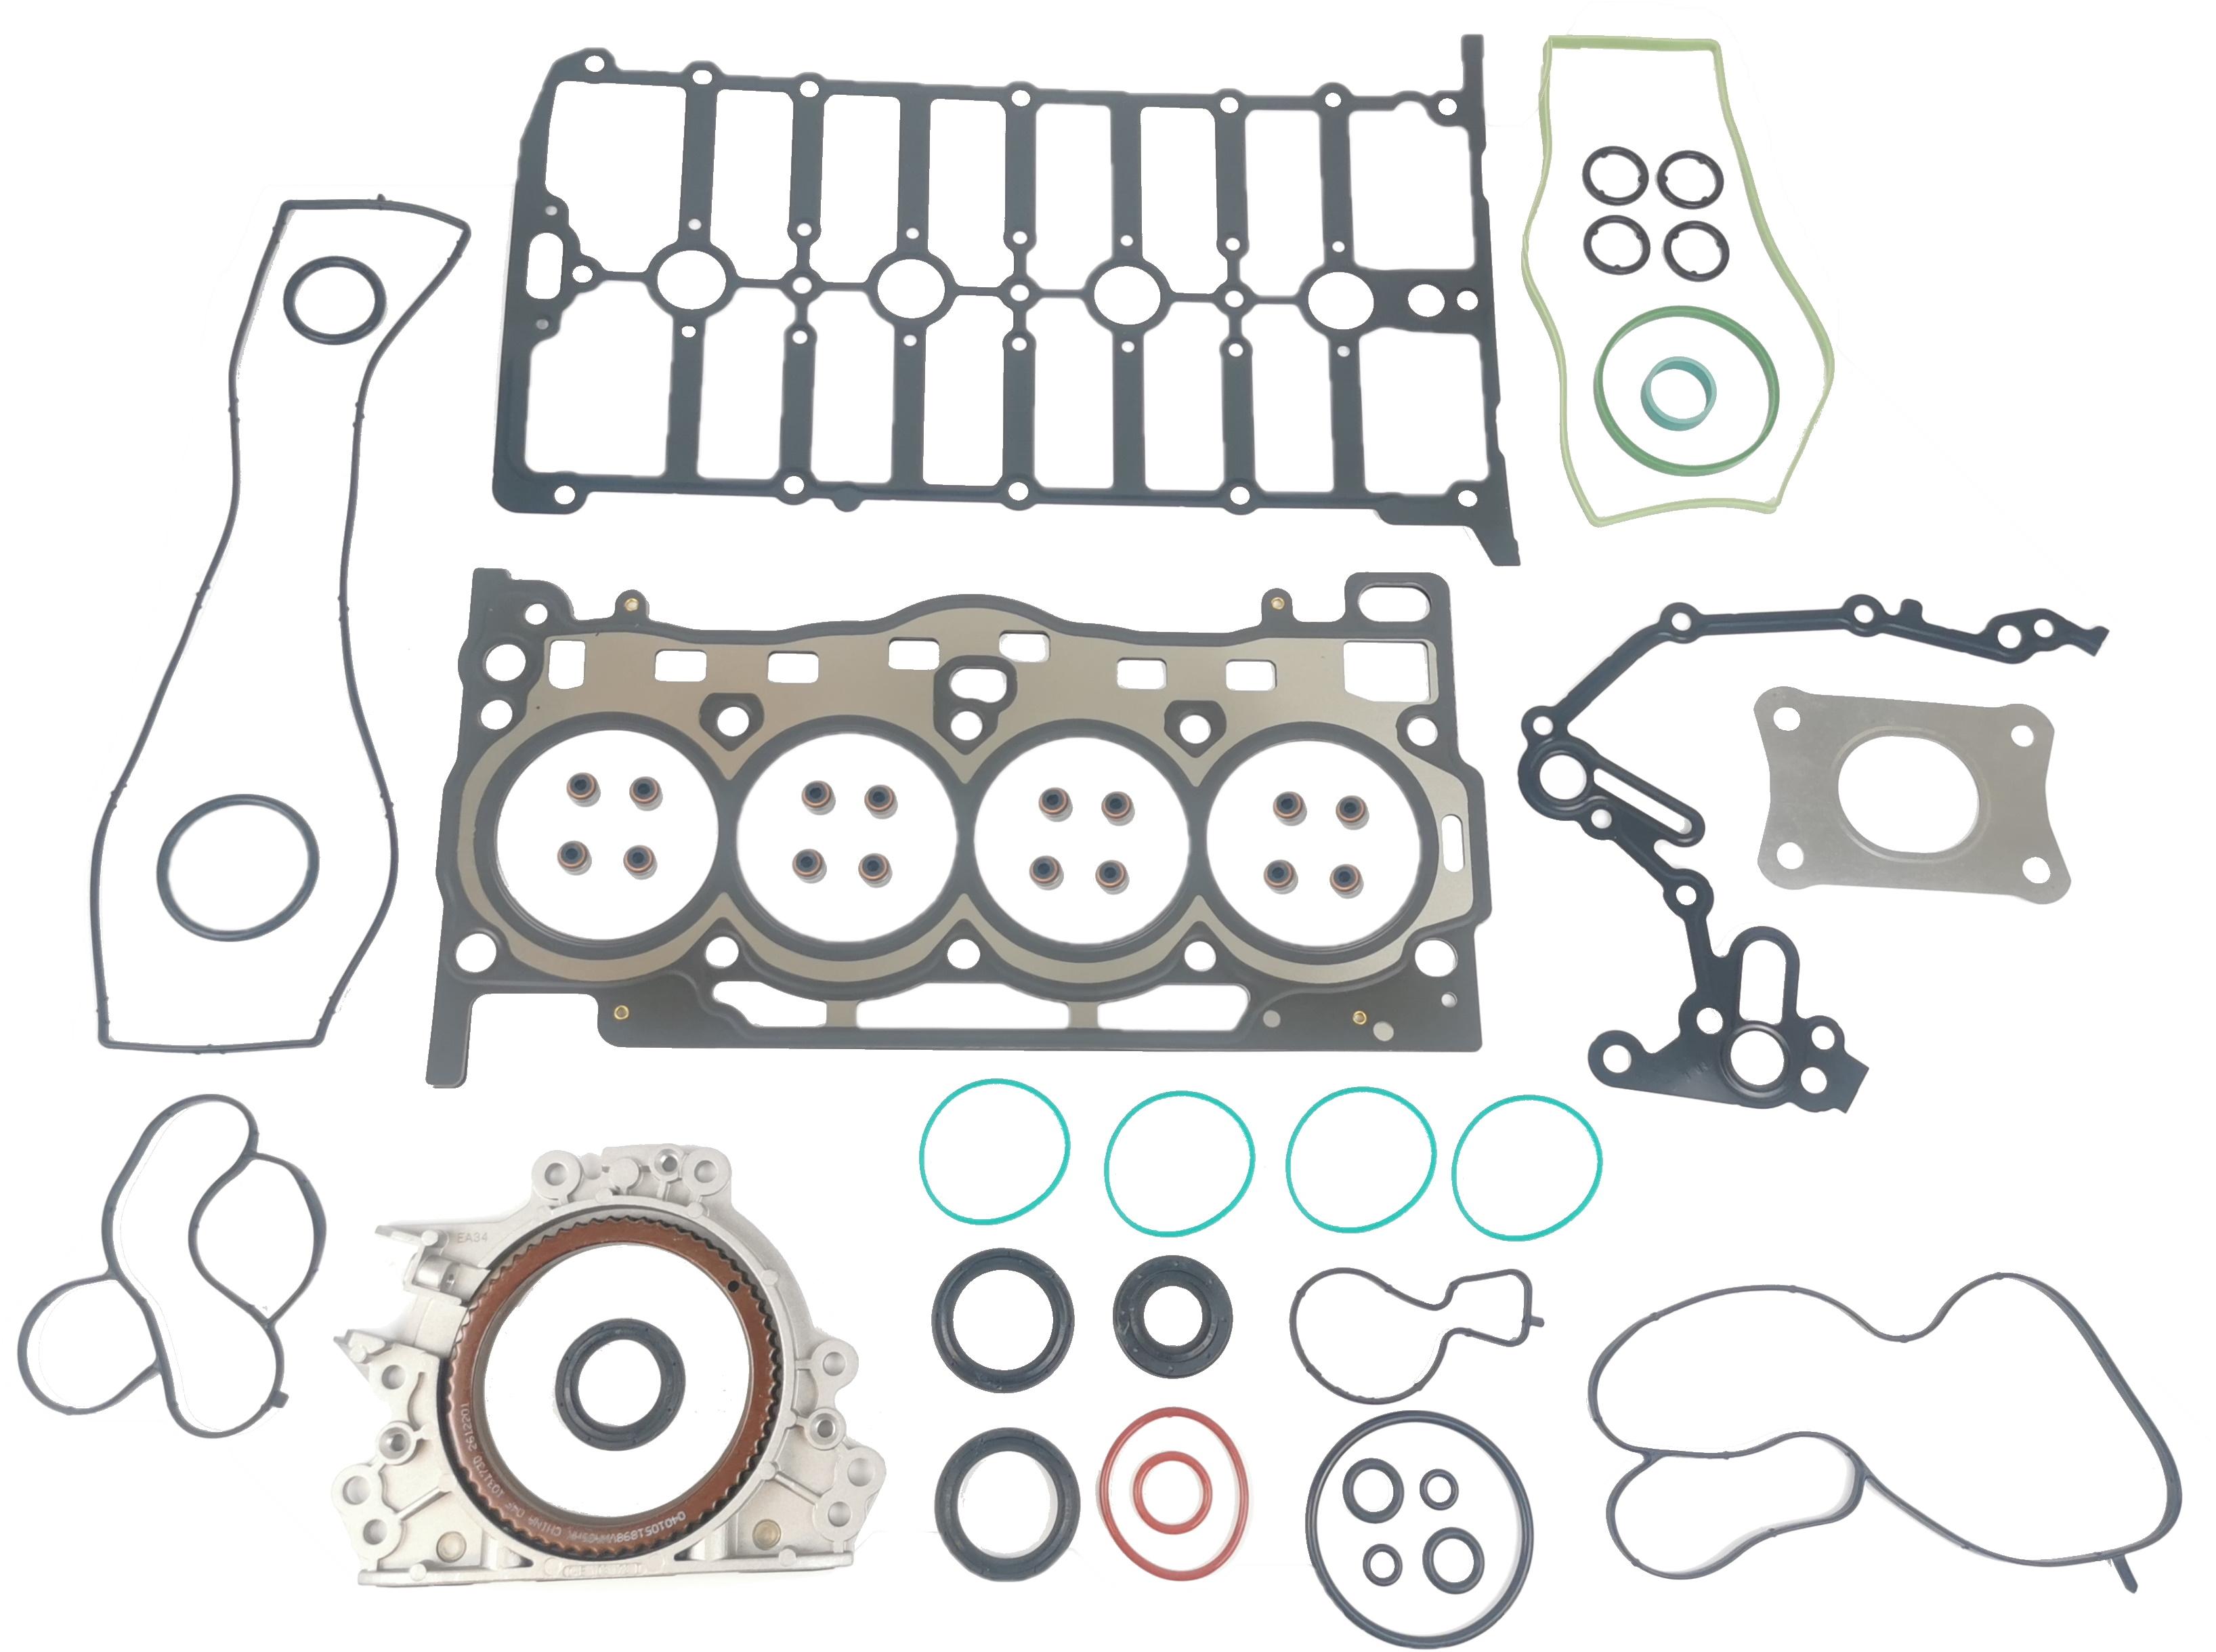 Zylinderkopfdichtung Dichtungssatz für Audi Seat Skoda VW 1,4 TSI TFSI CZDB NEU